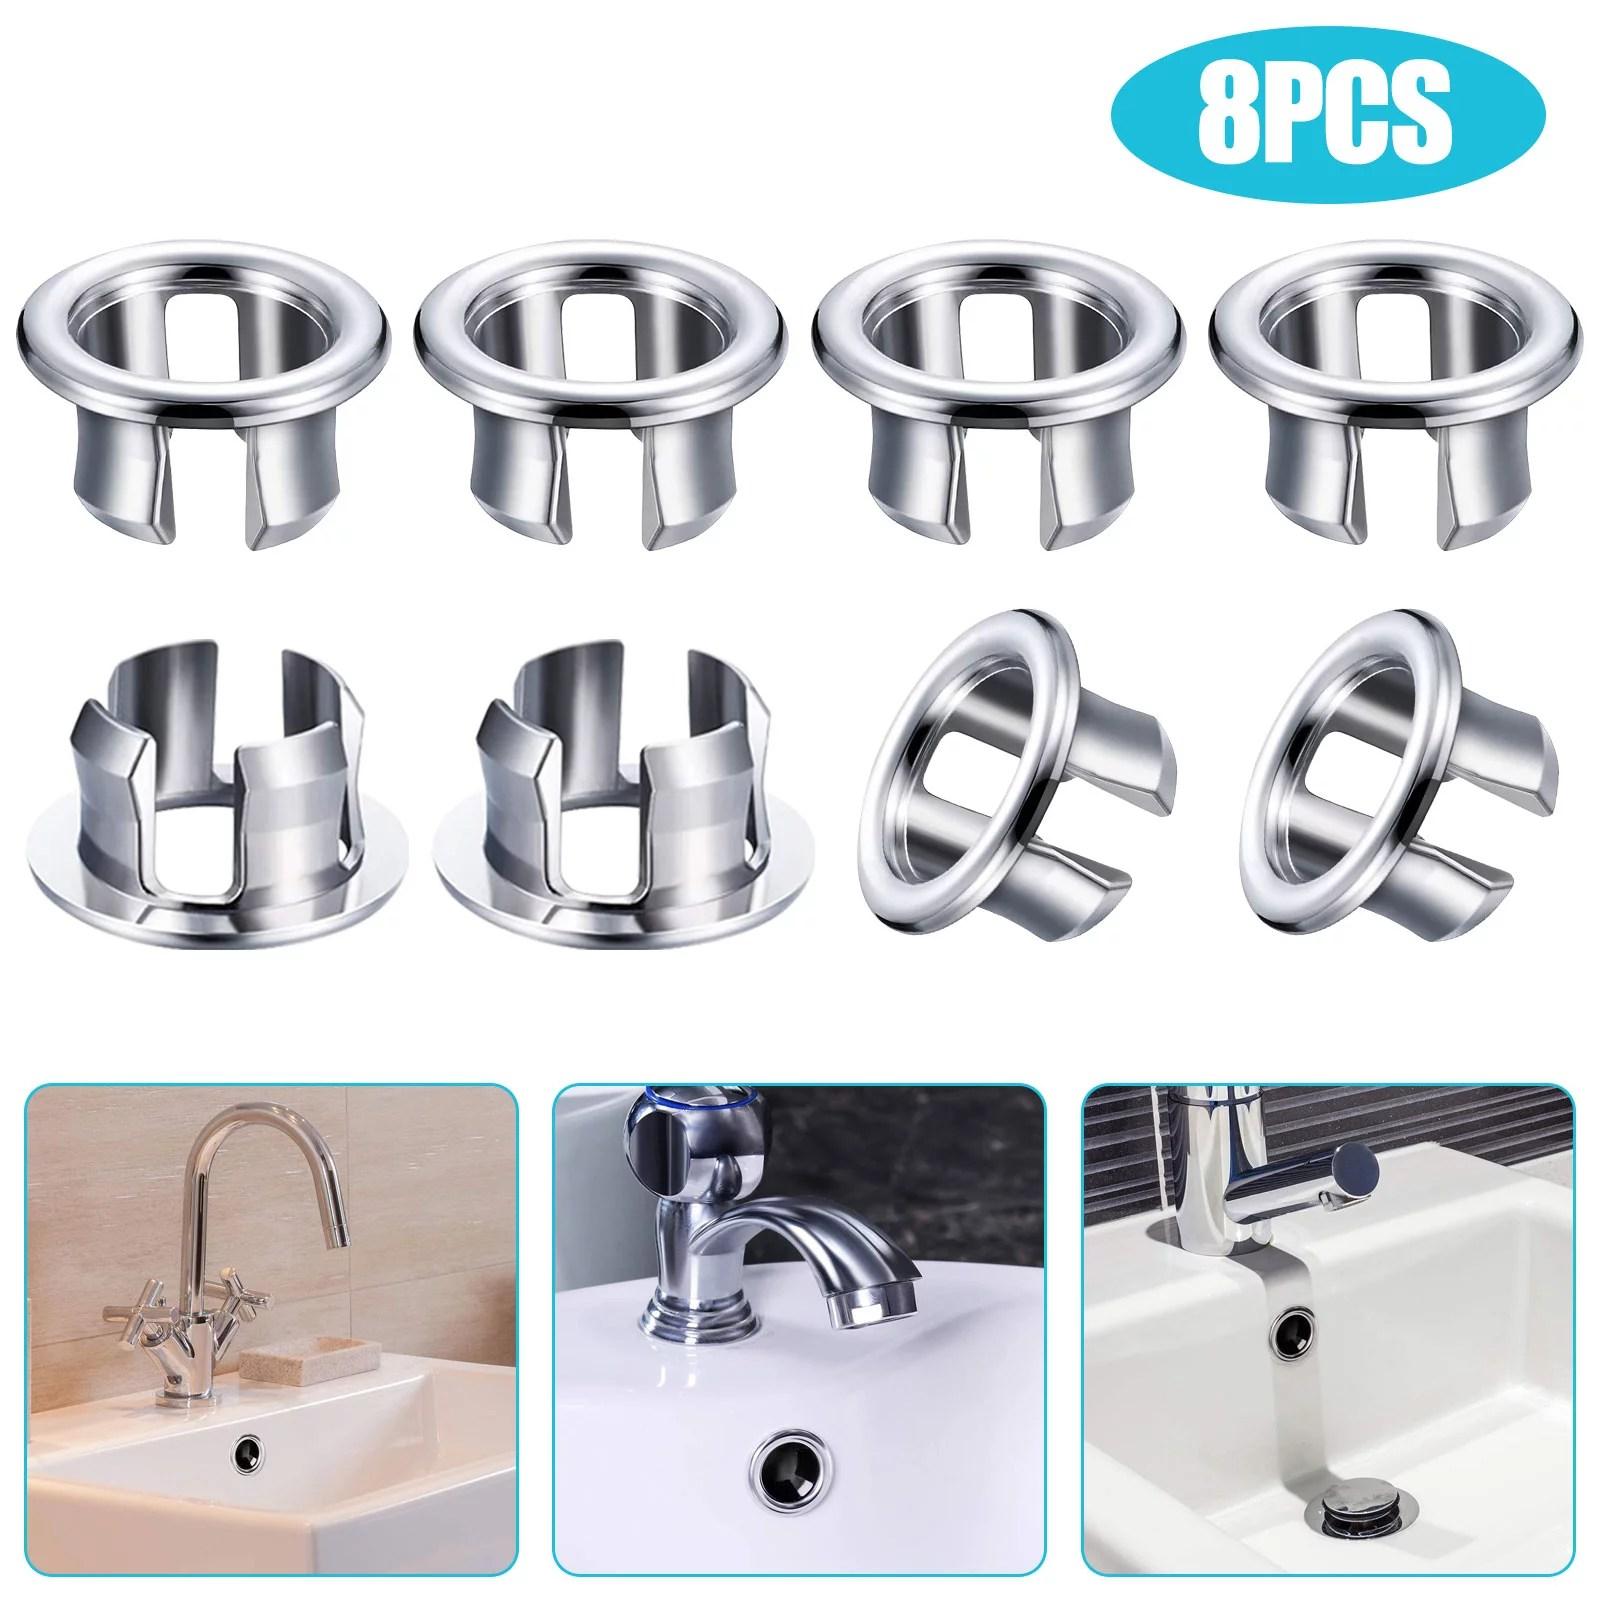 eeekit 24 16 8pcs sink overflow ring kitchen bathroom basin trim bath sink hole round overflow drain cap cover insert in hole spares silver